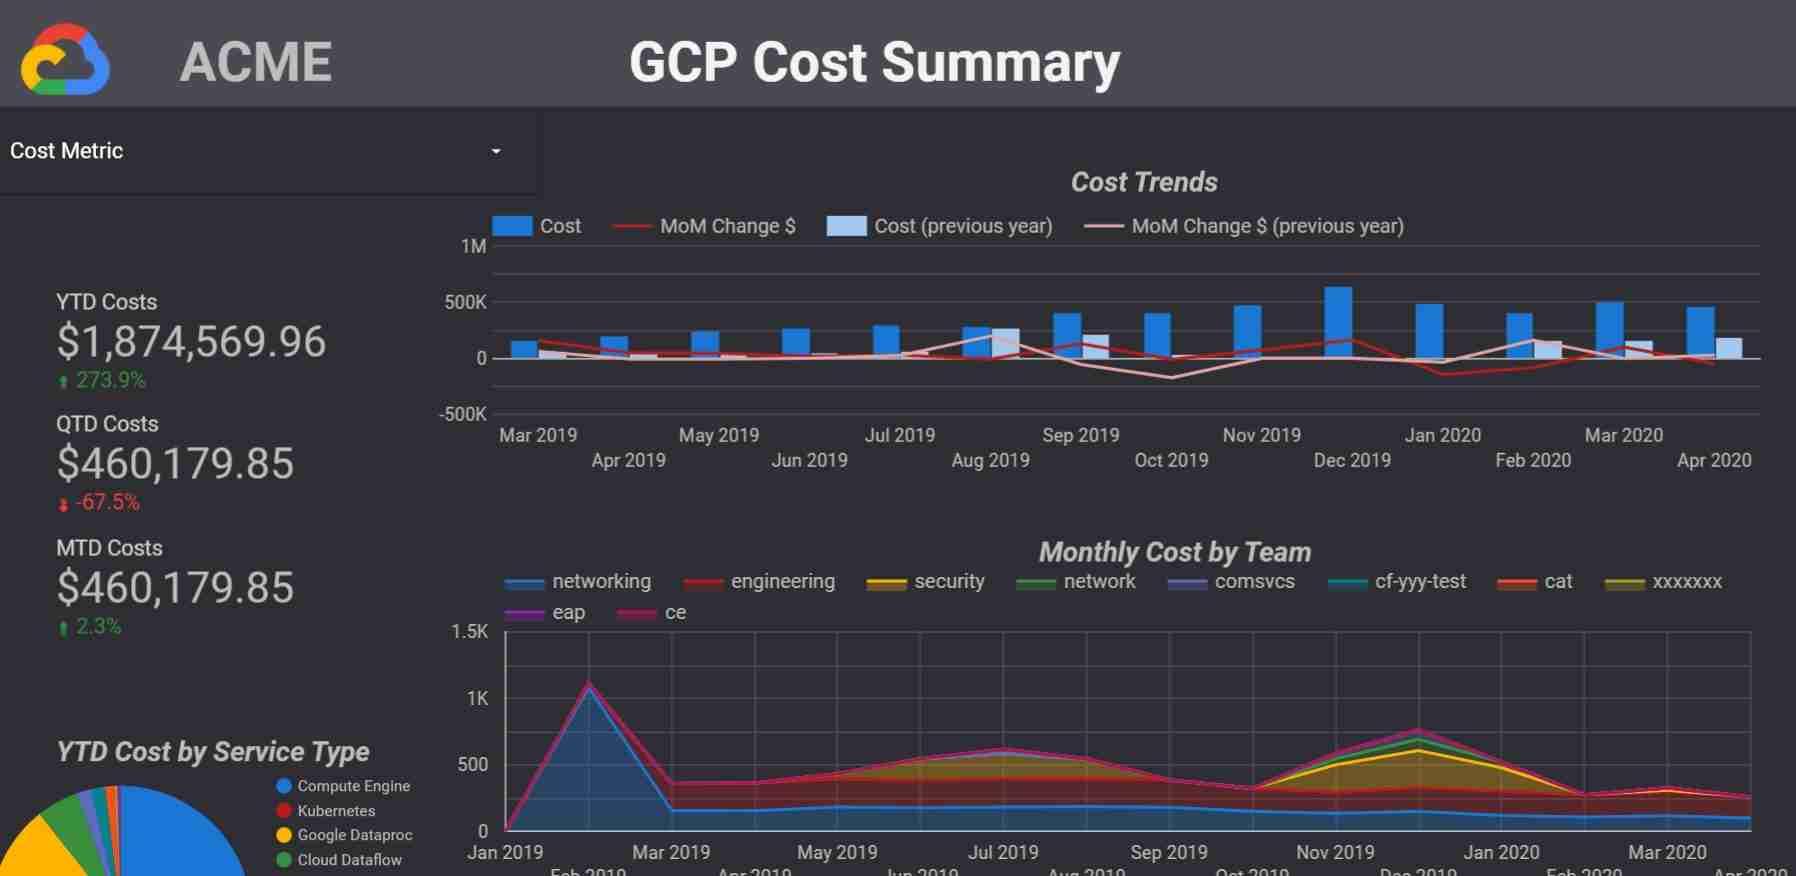 gcp cost summary dashboard in dark